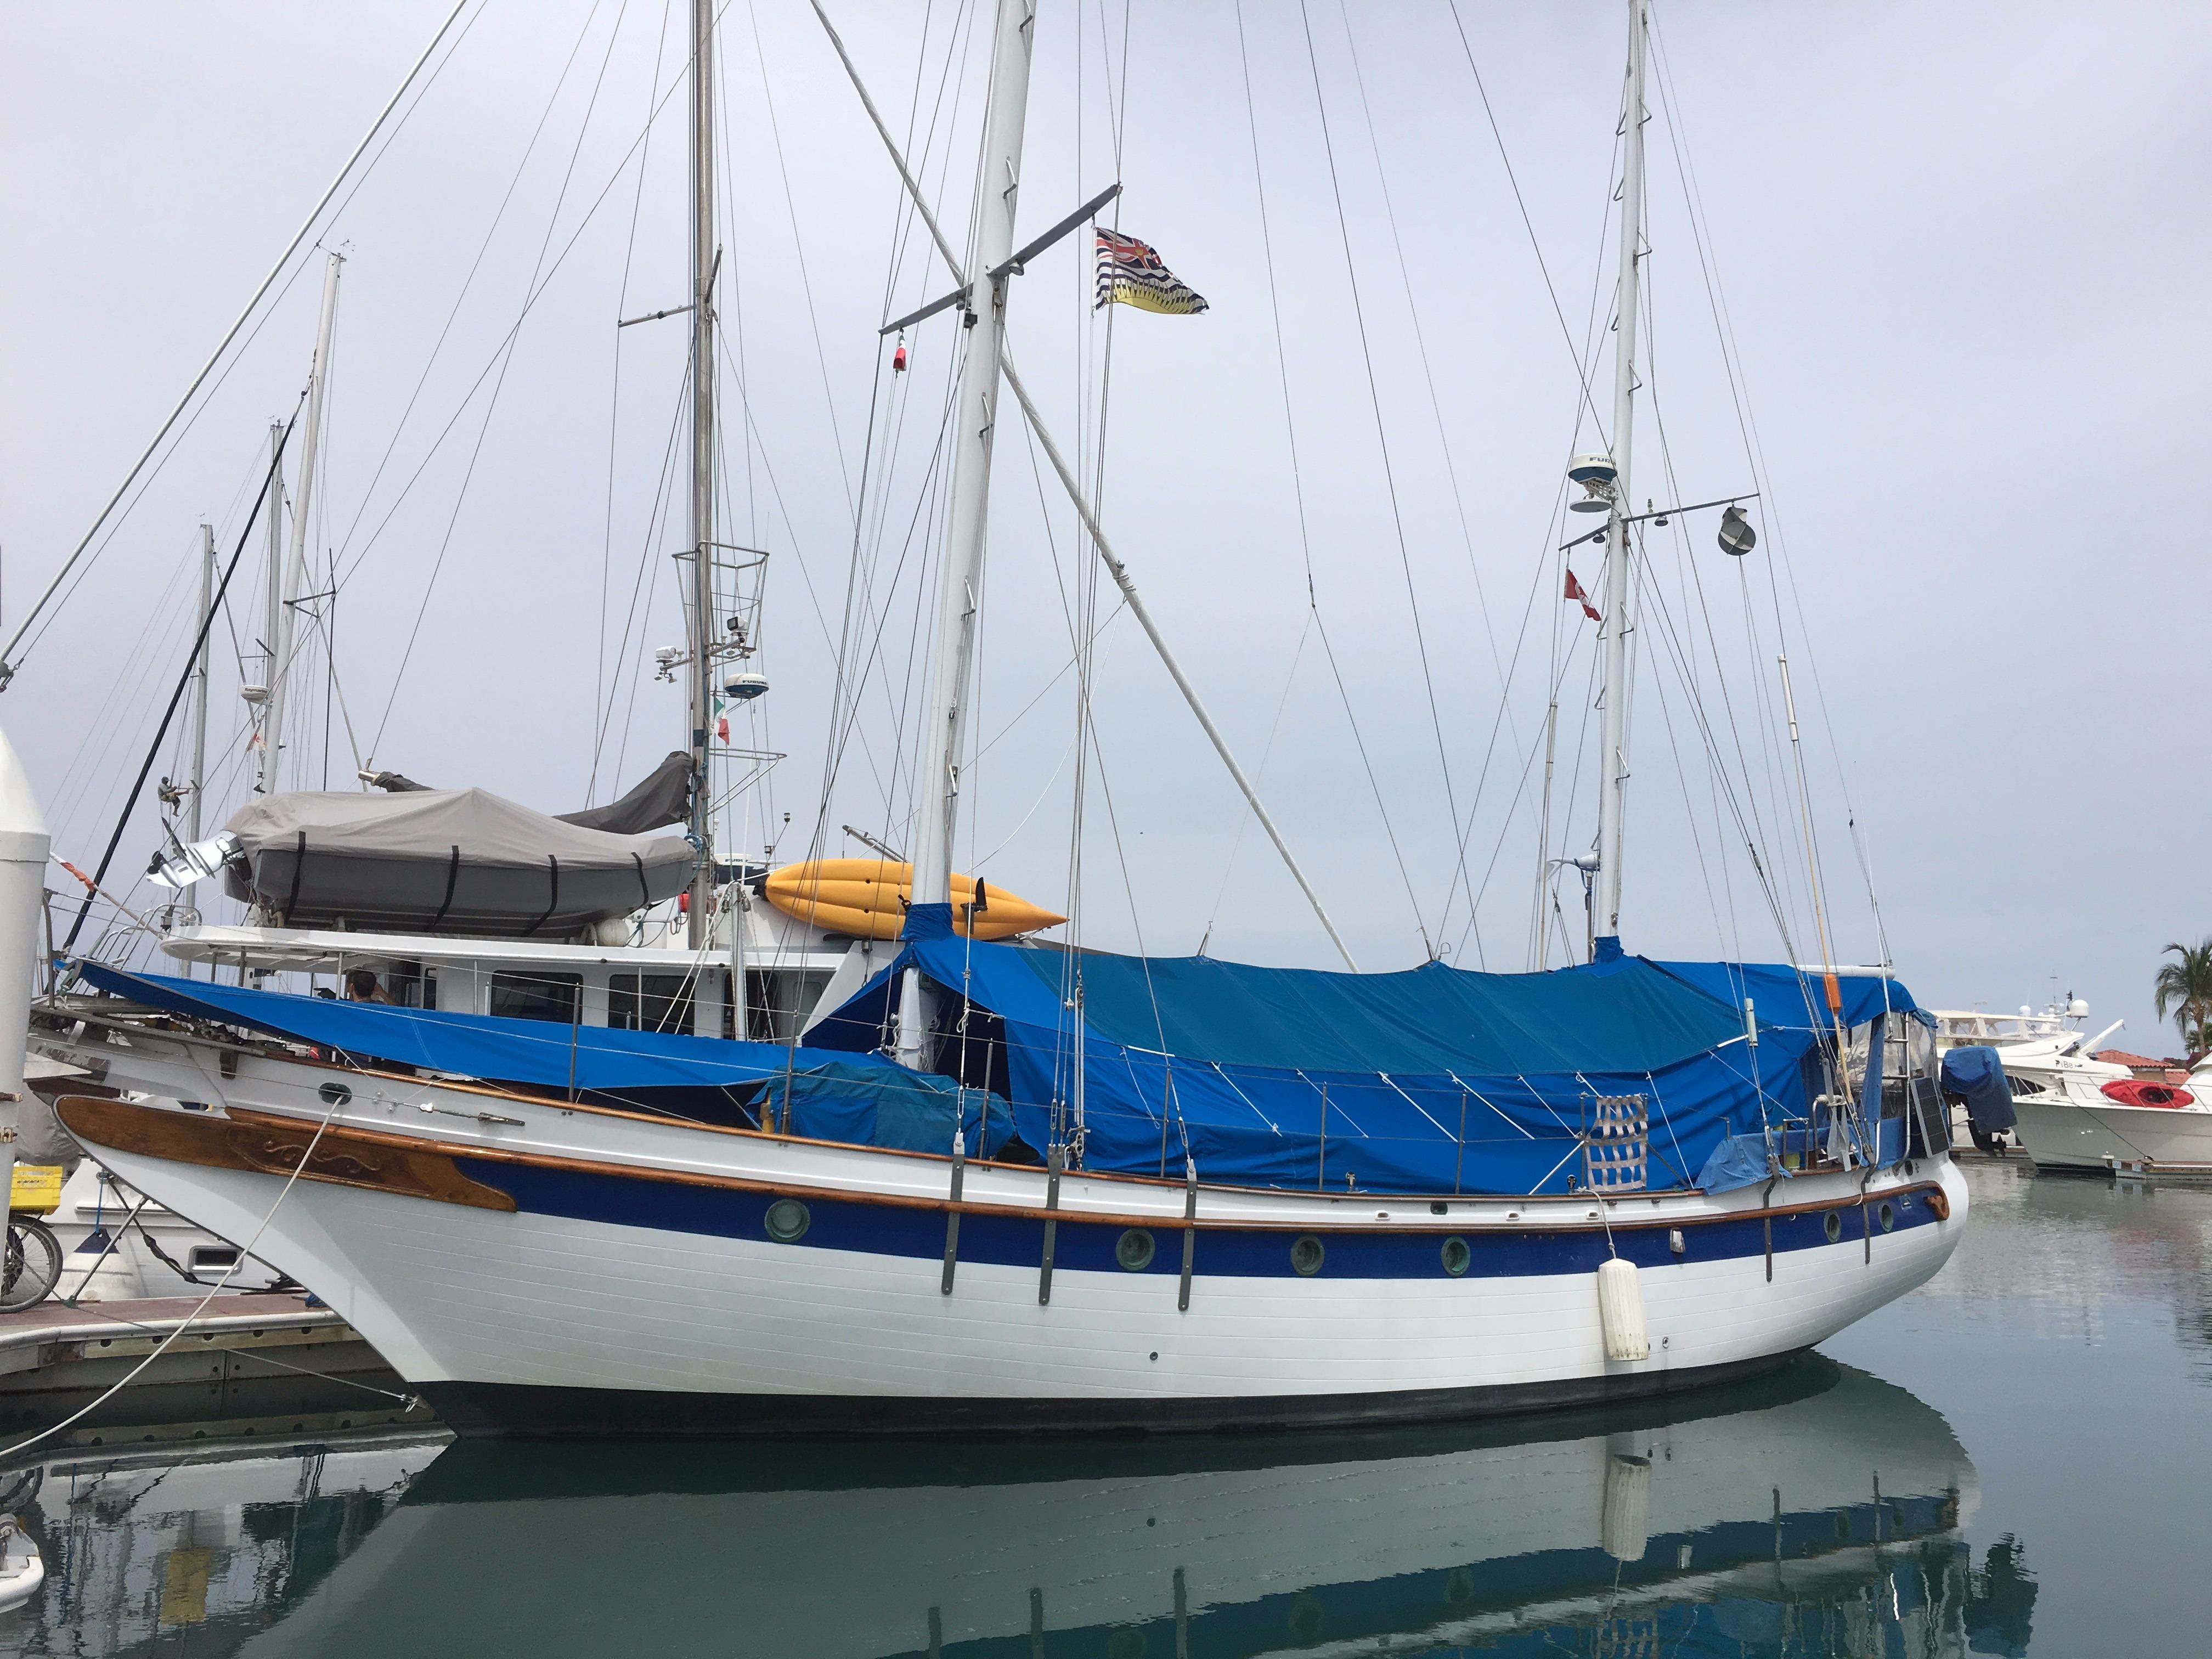 51' Formosa Island Trader Ketch+Photo 1